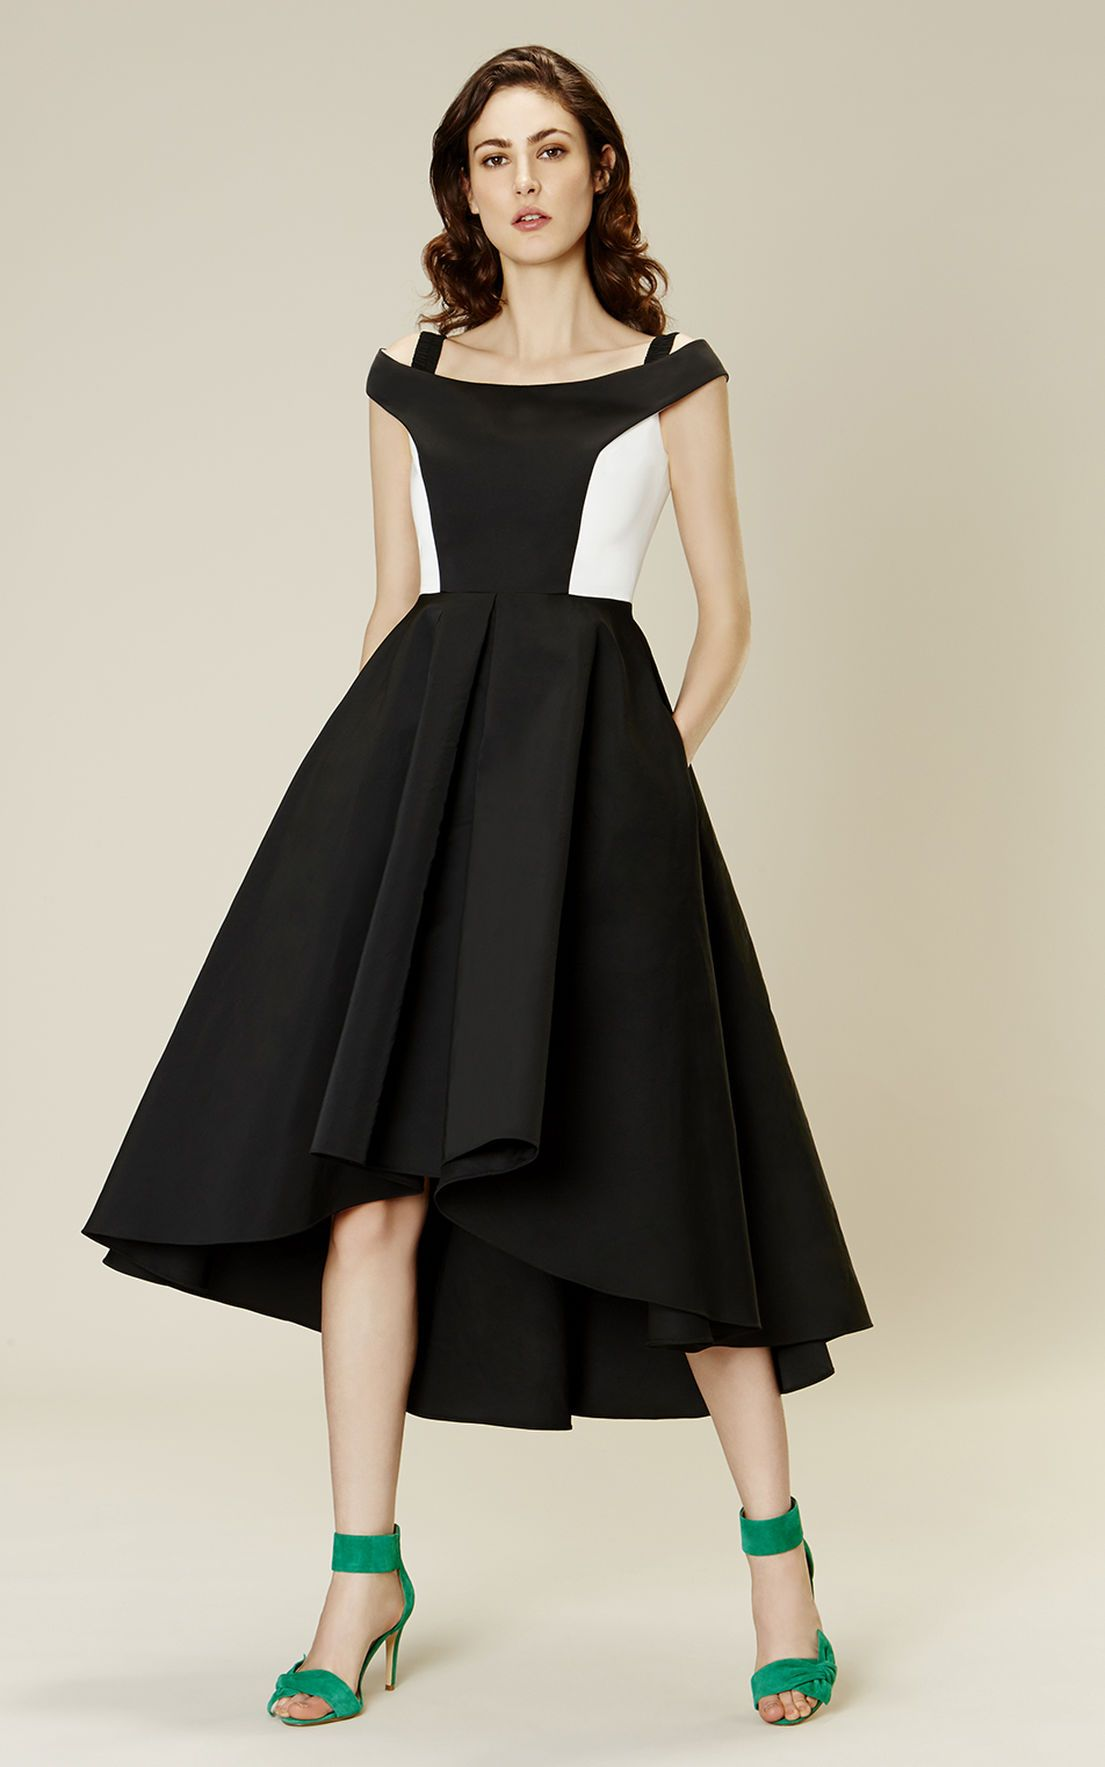 Karen millen offtheshoulder prom dress black u ivory wardrobe